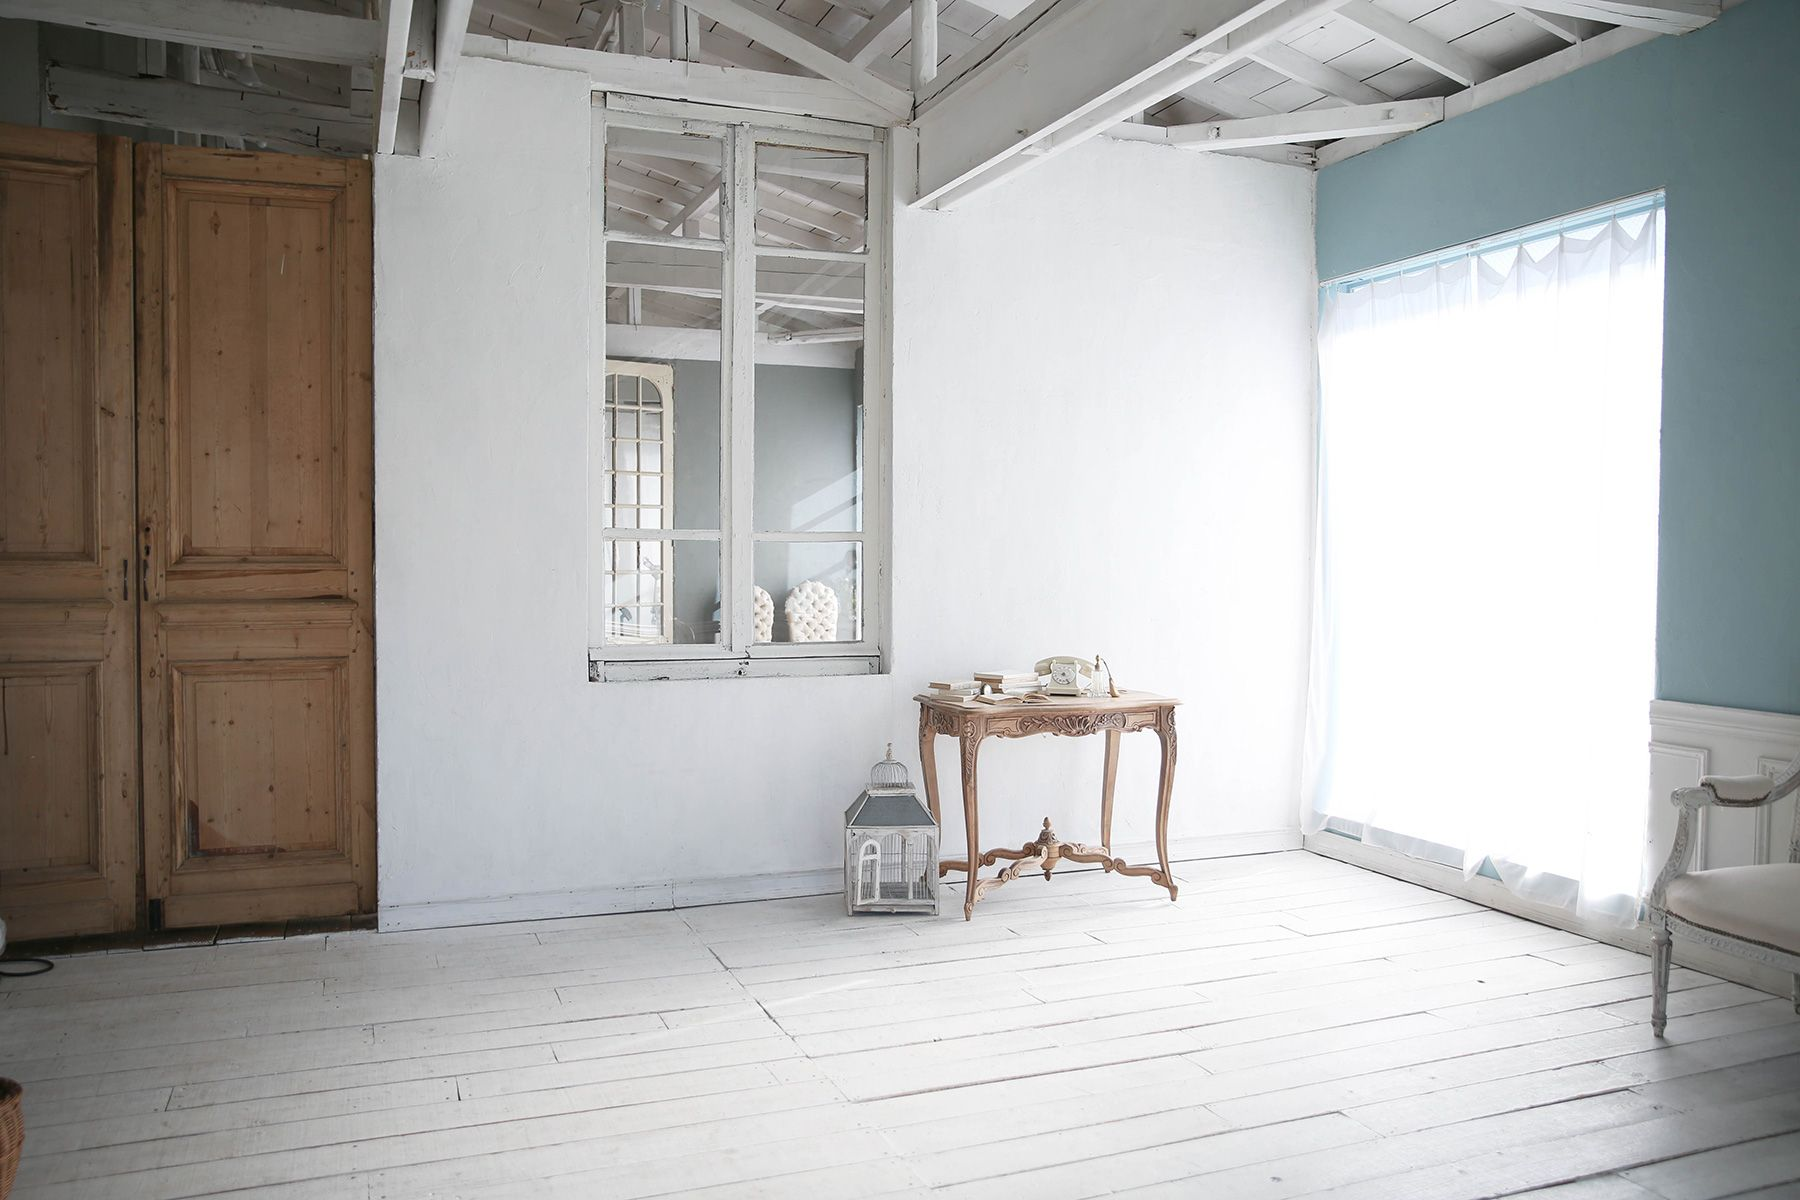 studio itto 目黒碑文谷2Fst (スタジオ イット)南側 白壁